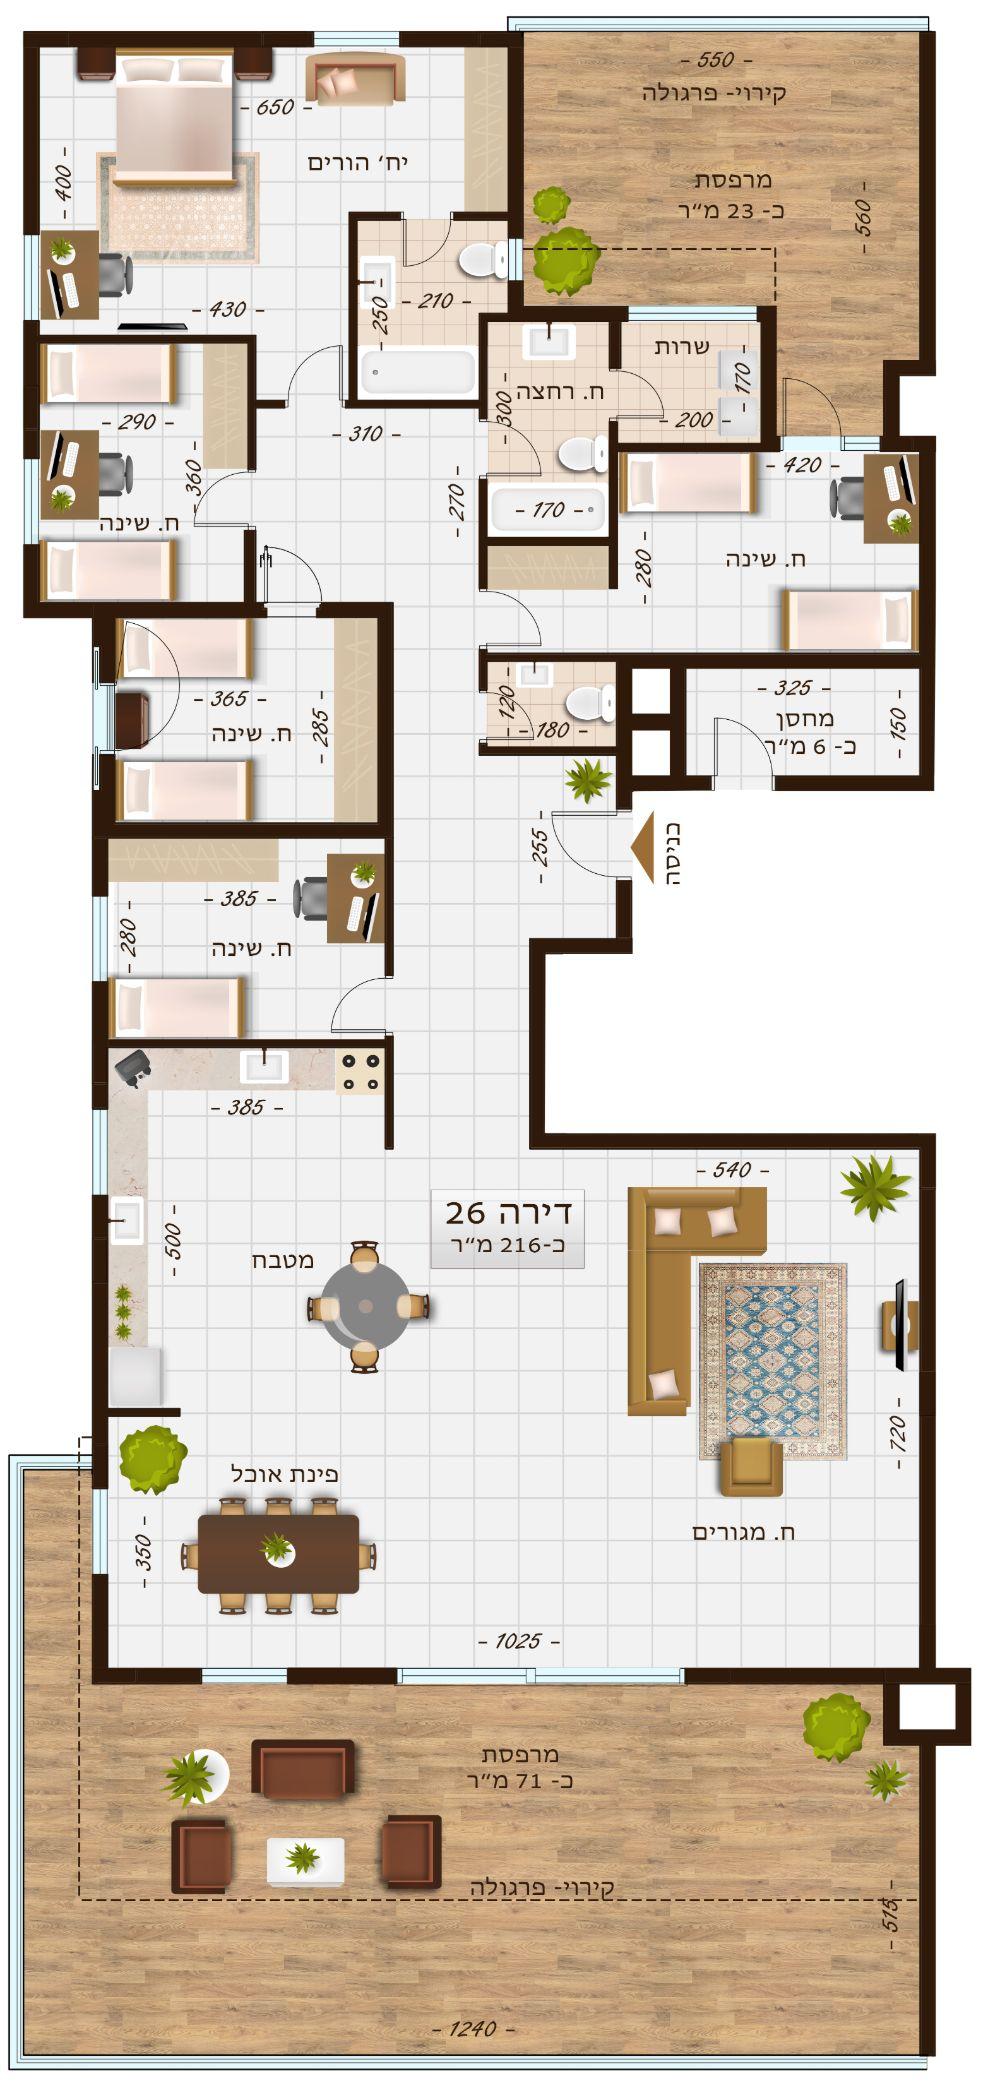 בניין 1107 דירה 26